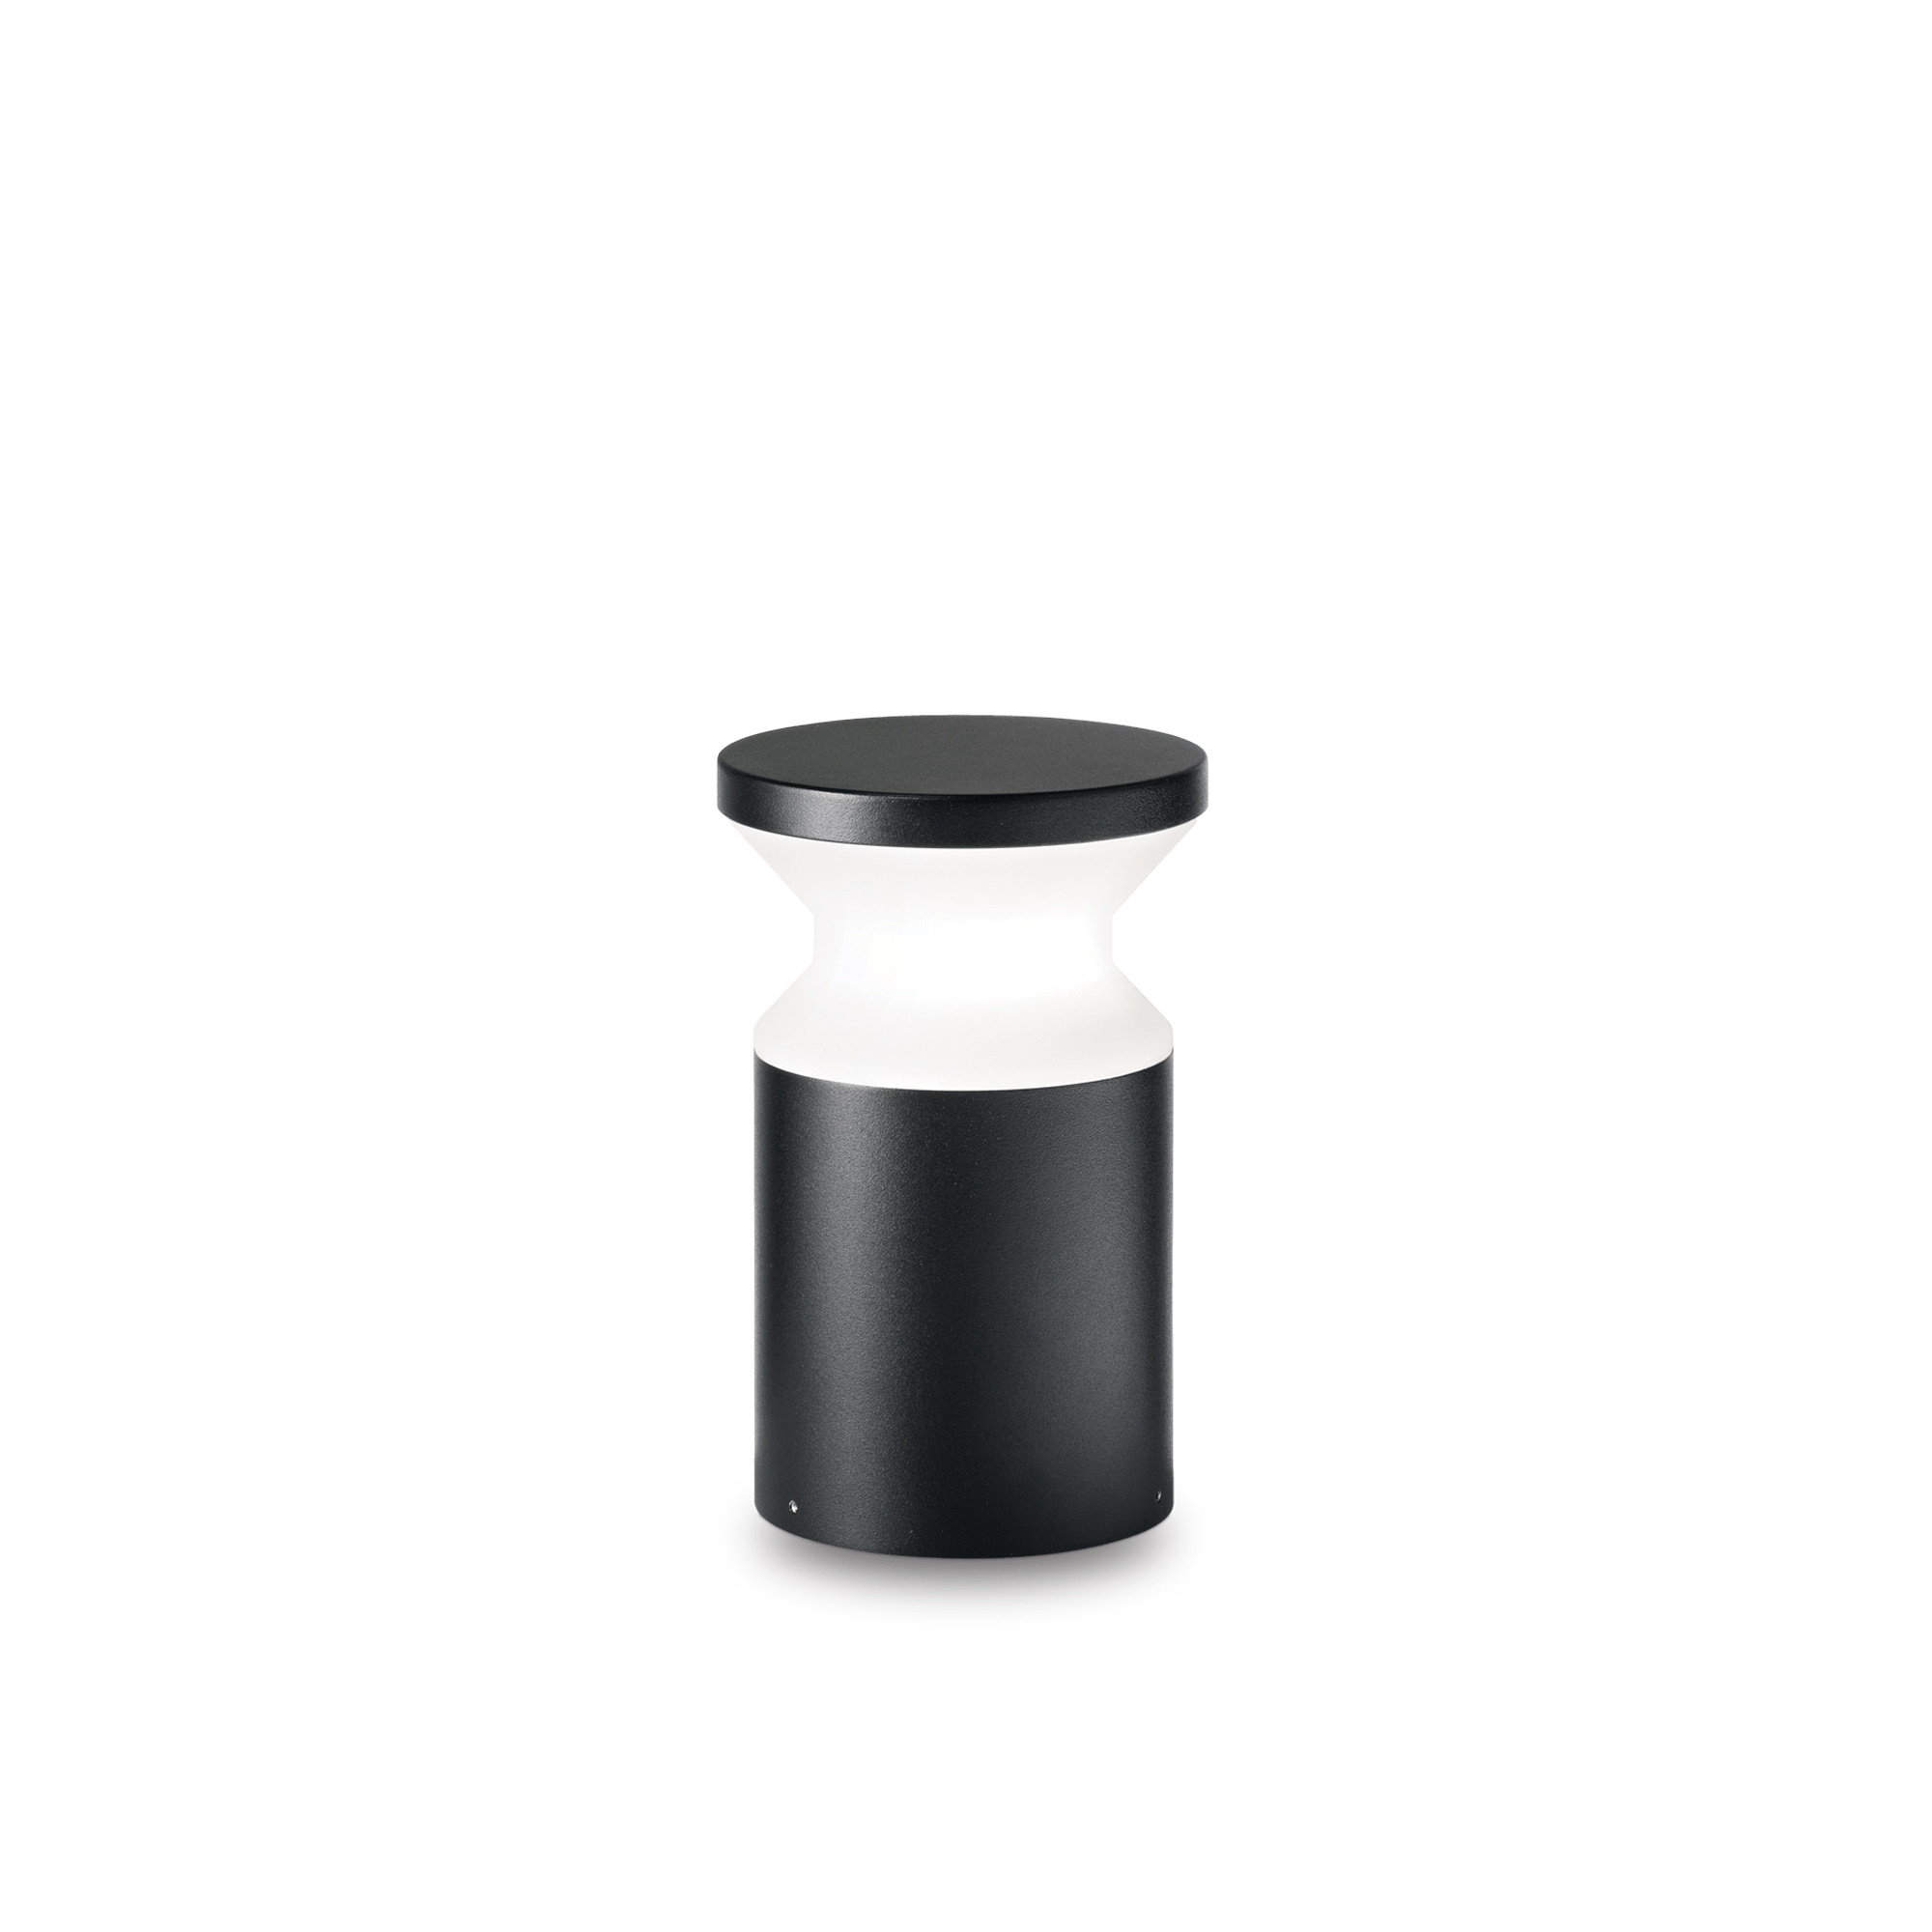 IdealLux TORRE PT1 SMALL NERO